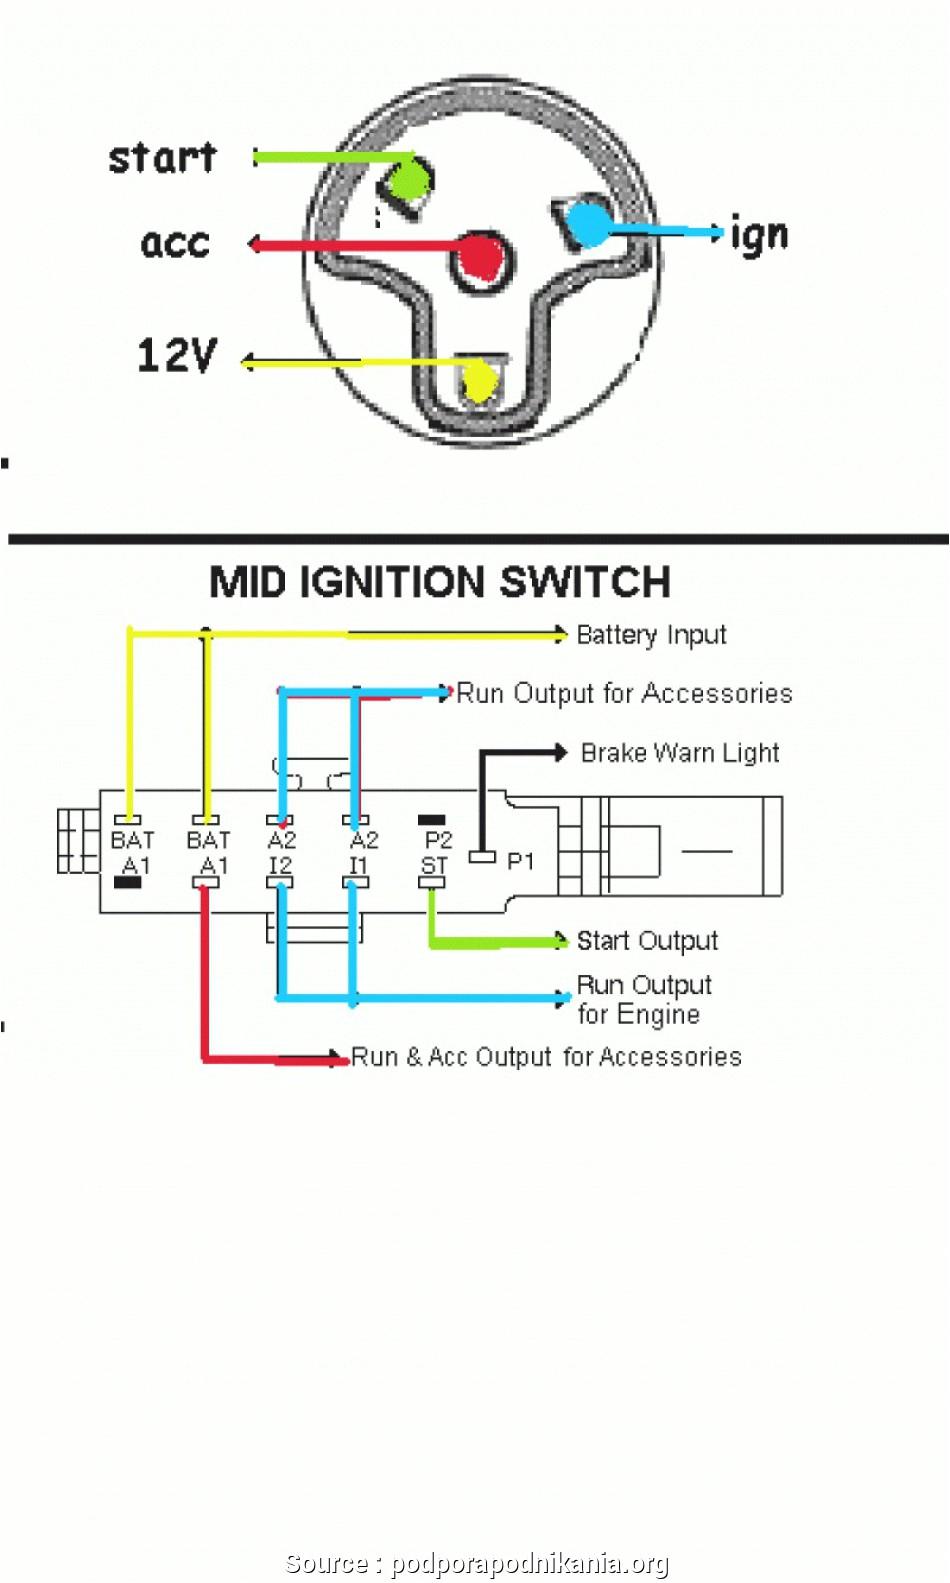 universal ignition switch diagram wiring diagram name 4 wire ignition switch schematic diagram wiring diagram datasource